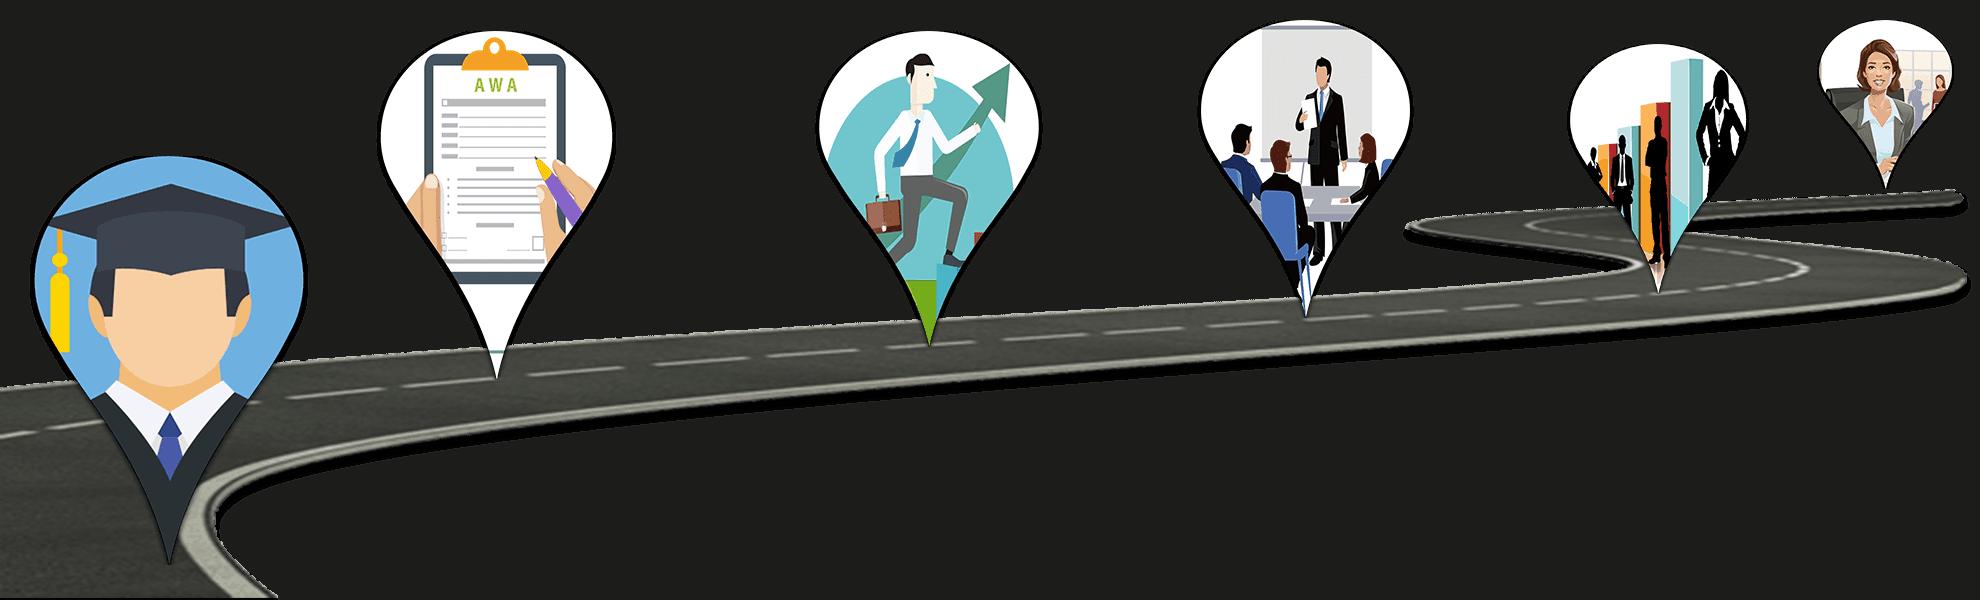 RoadMap Image